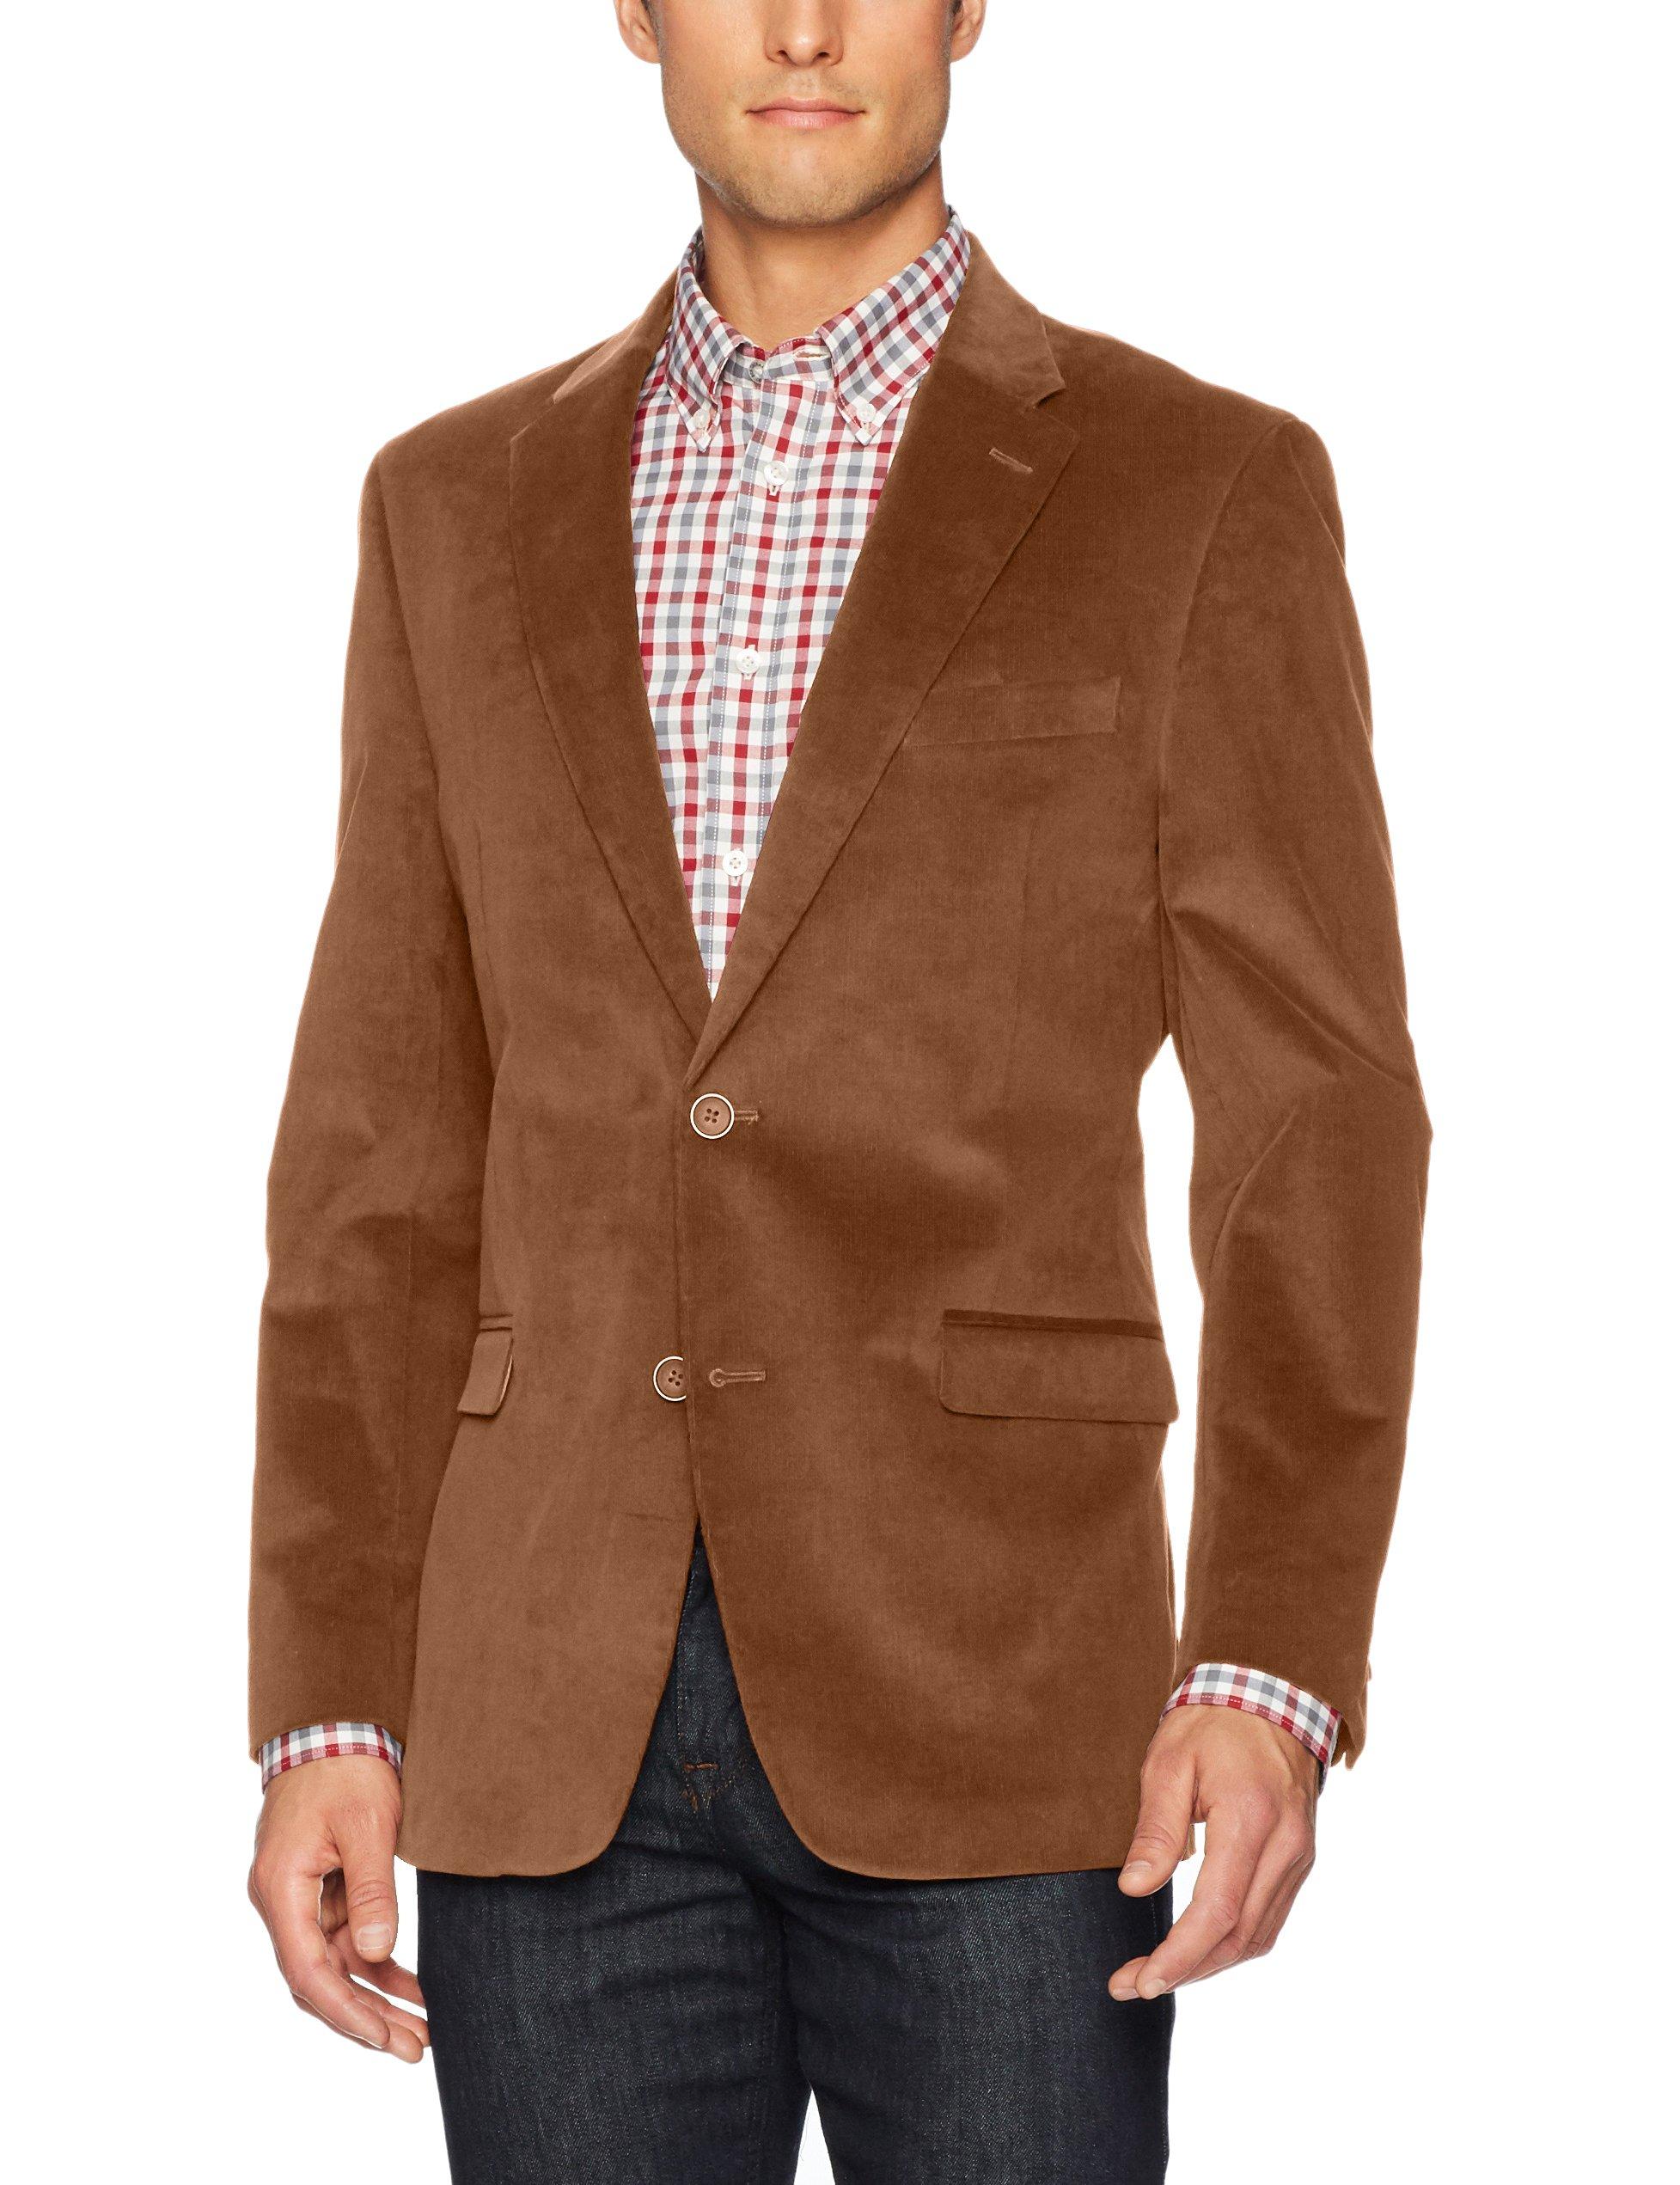 Tommy Hilfiger Men's Cord Stretch Sportcoat Blazer, Khaki, 42R